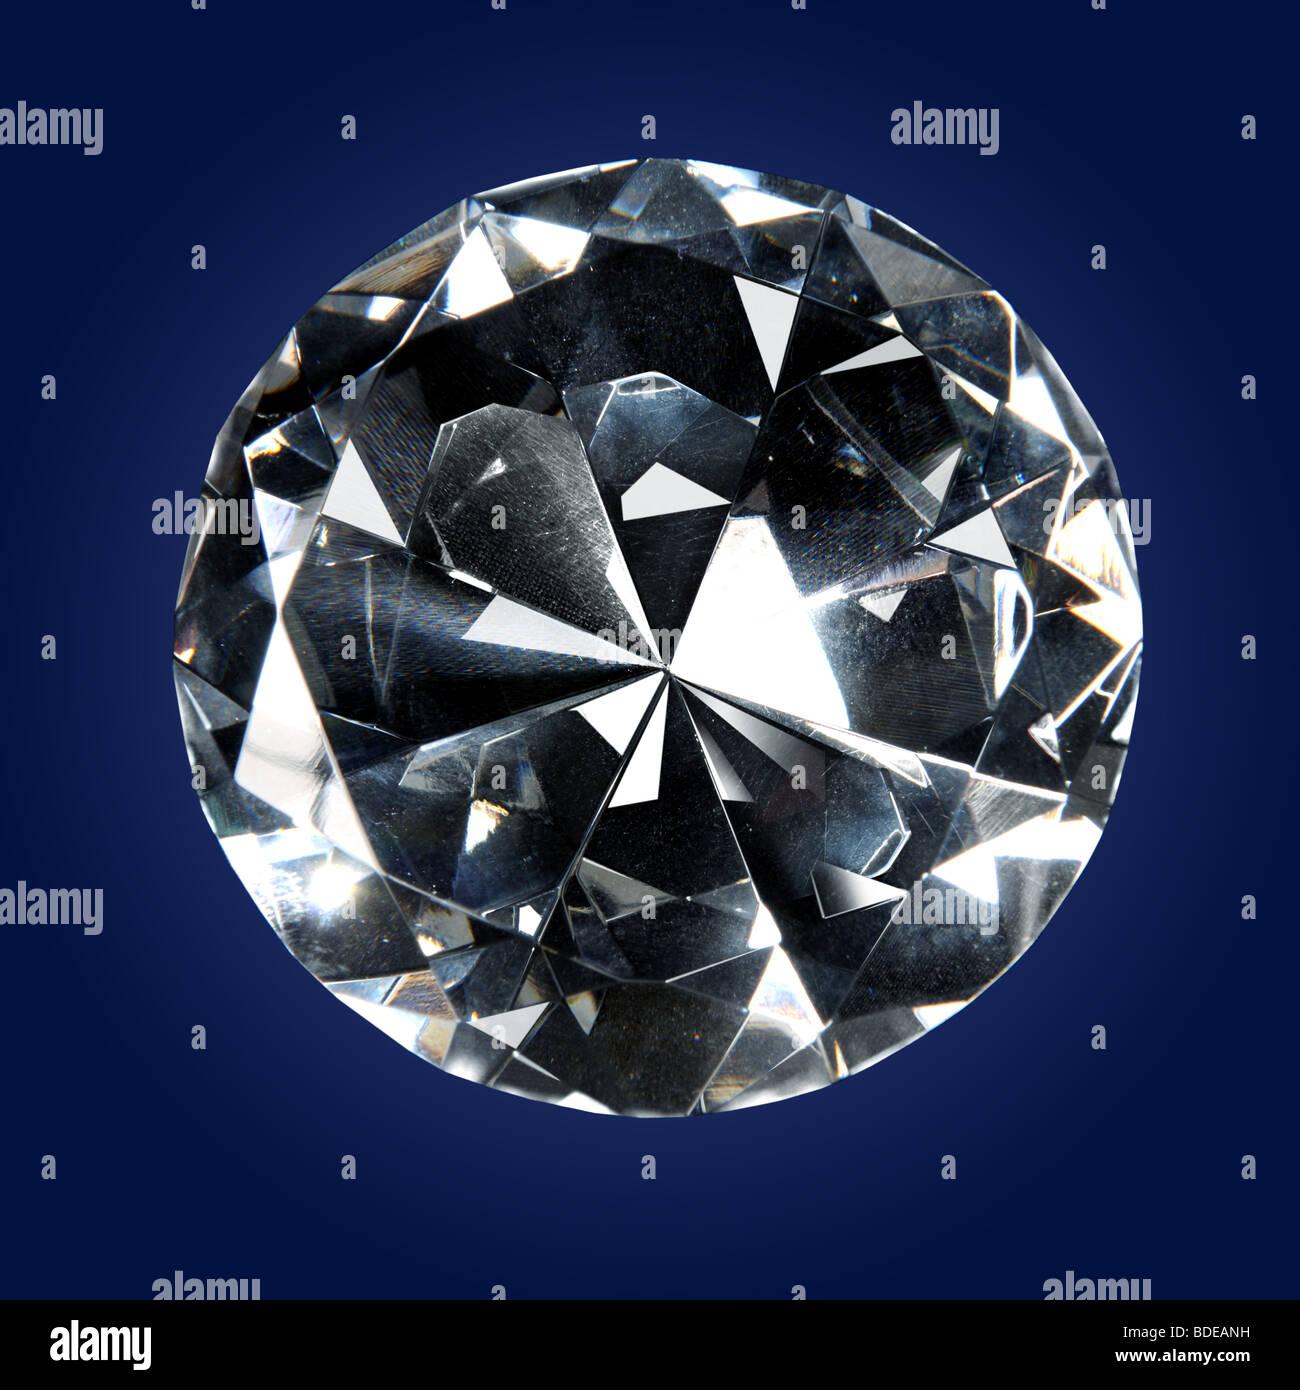 Single diamond over a dark background - Stock Image